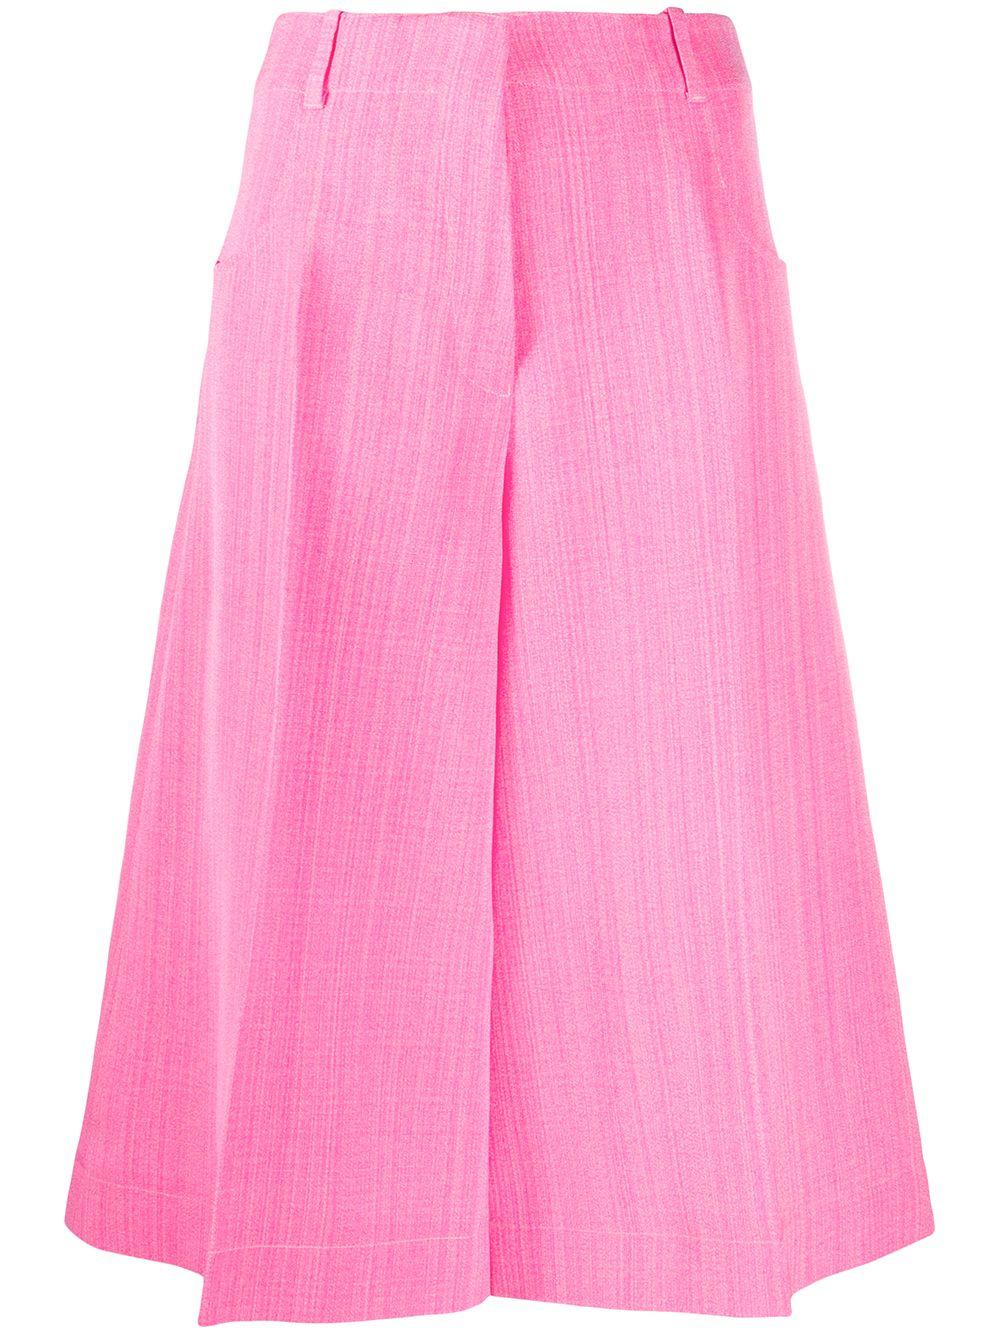 JACQUEMUS Trousers JACQUEMUS   Shorts   201PA0220108450PNK